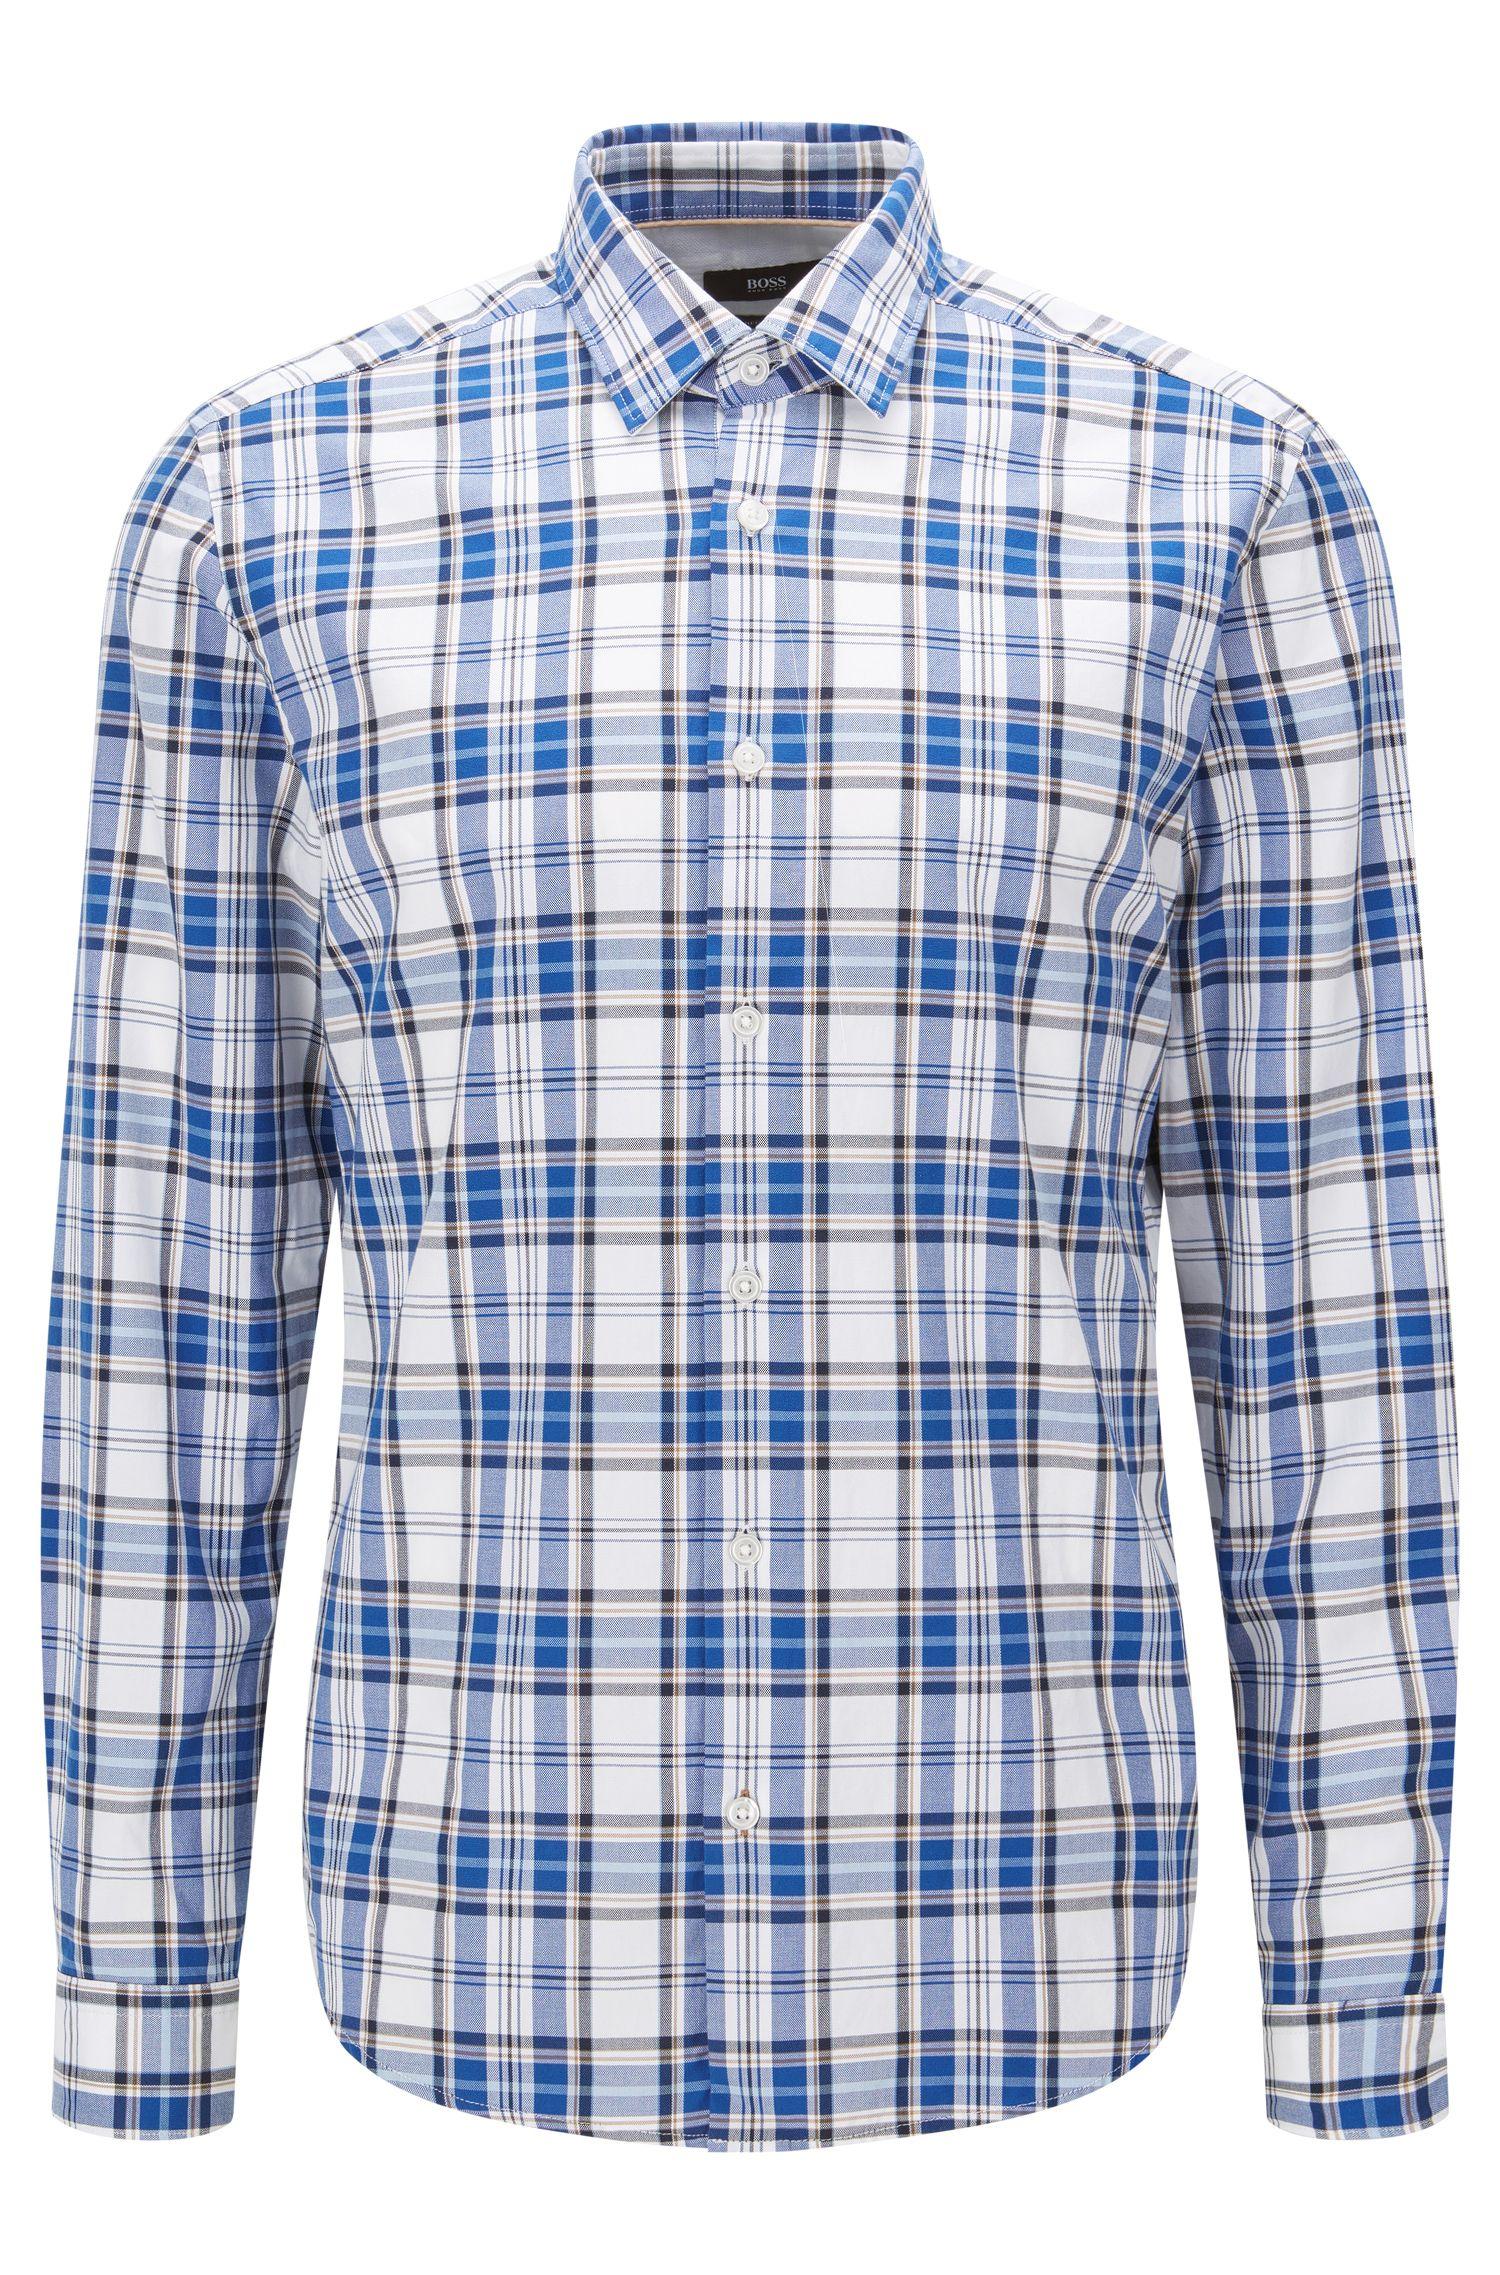 Plaid Cotton Button Down Shirt, Regular Fit | Lance